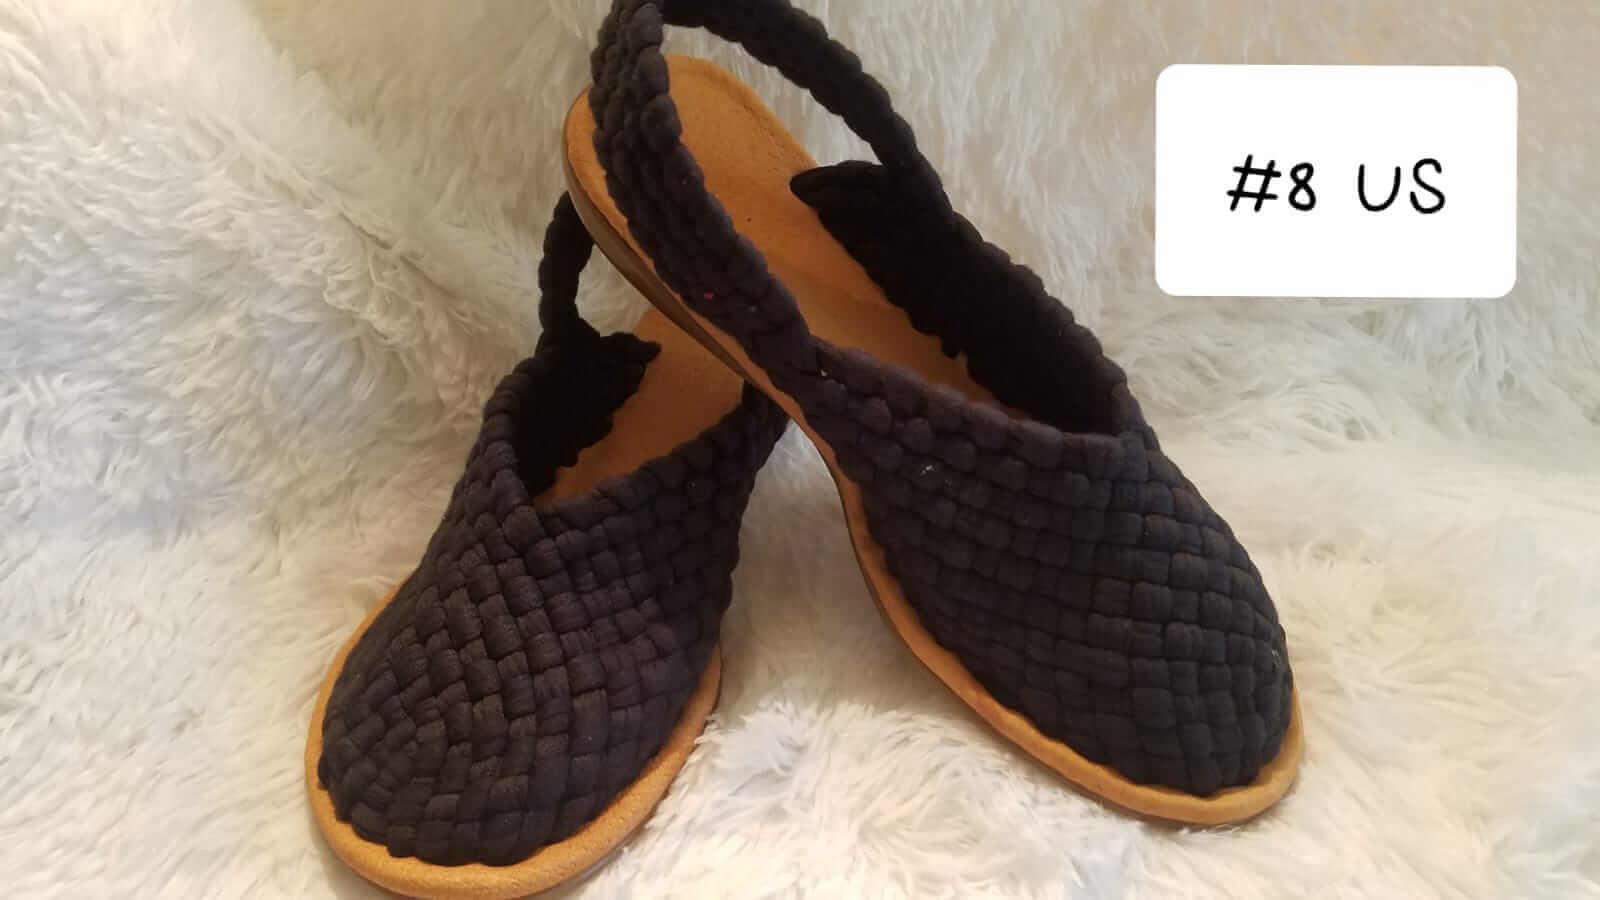 791f9c093d332 Handmade woven mexican sandals huaraches jpg 1600x900 Handmade mexican  sandals